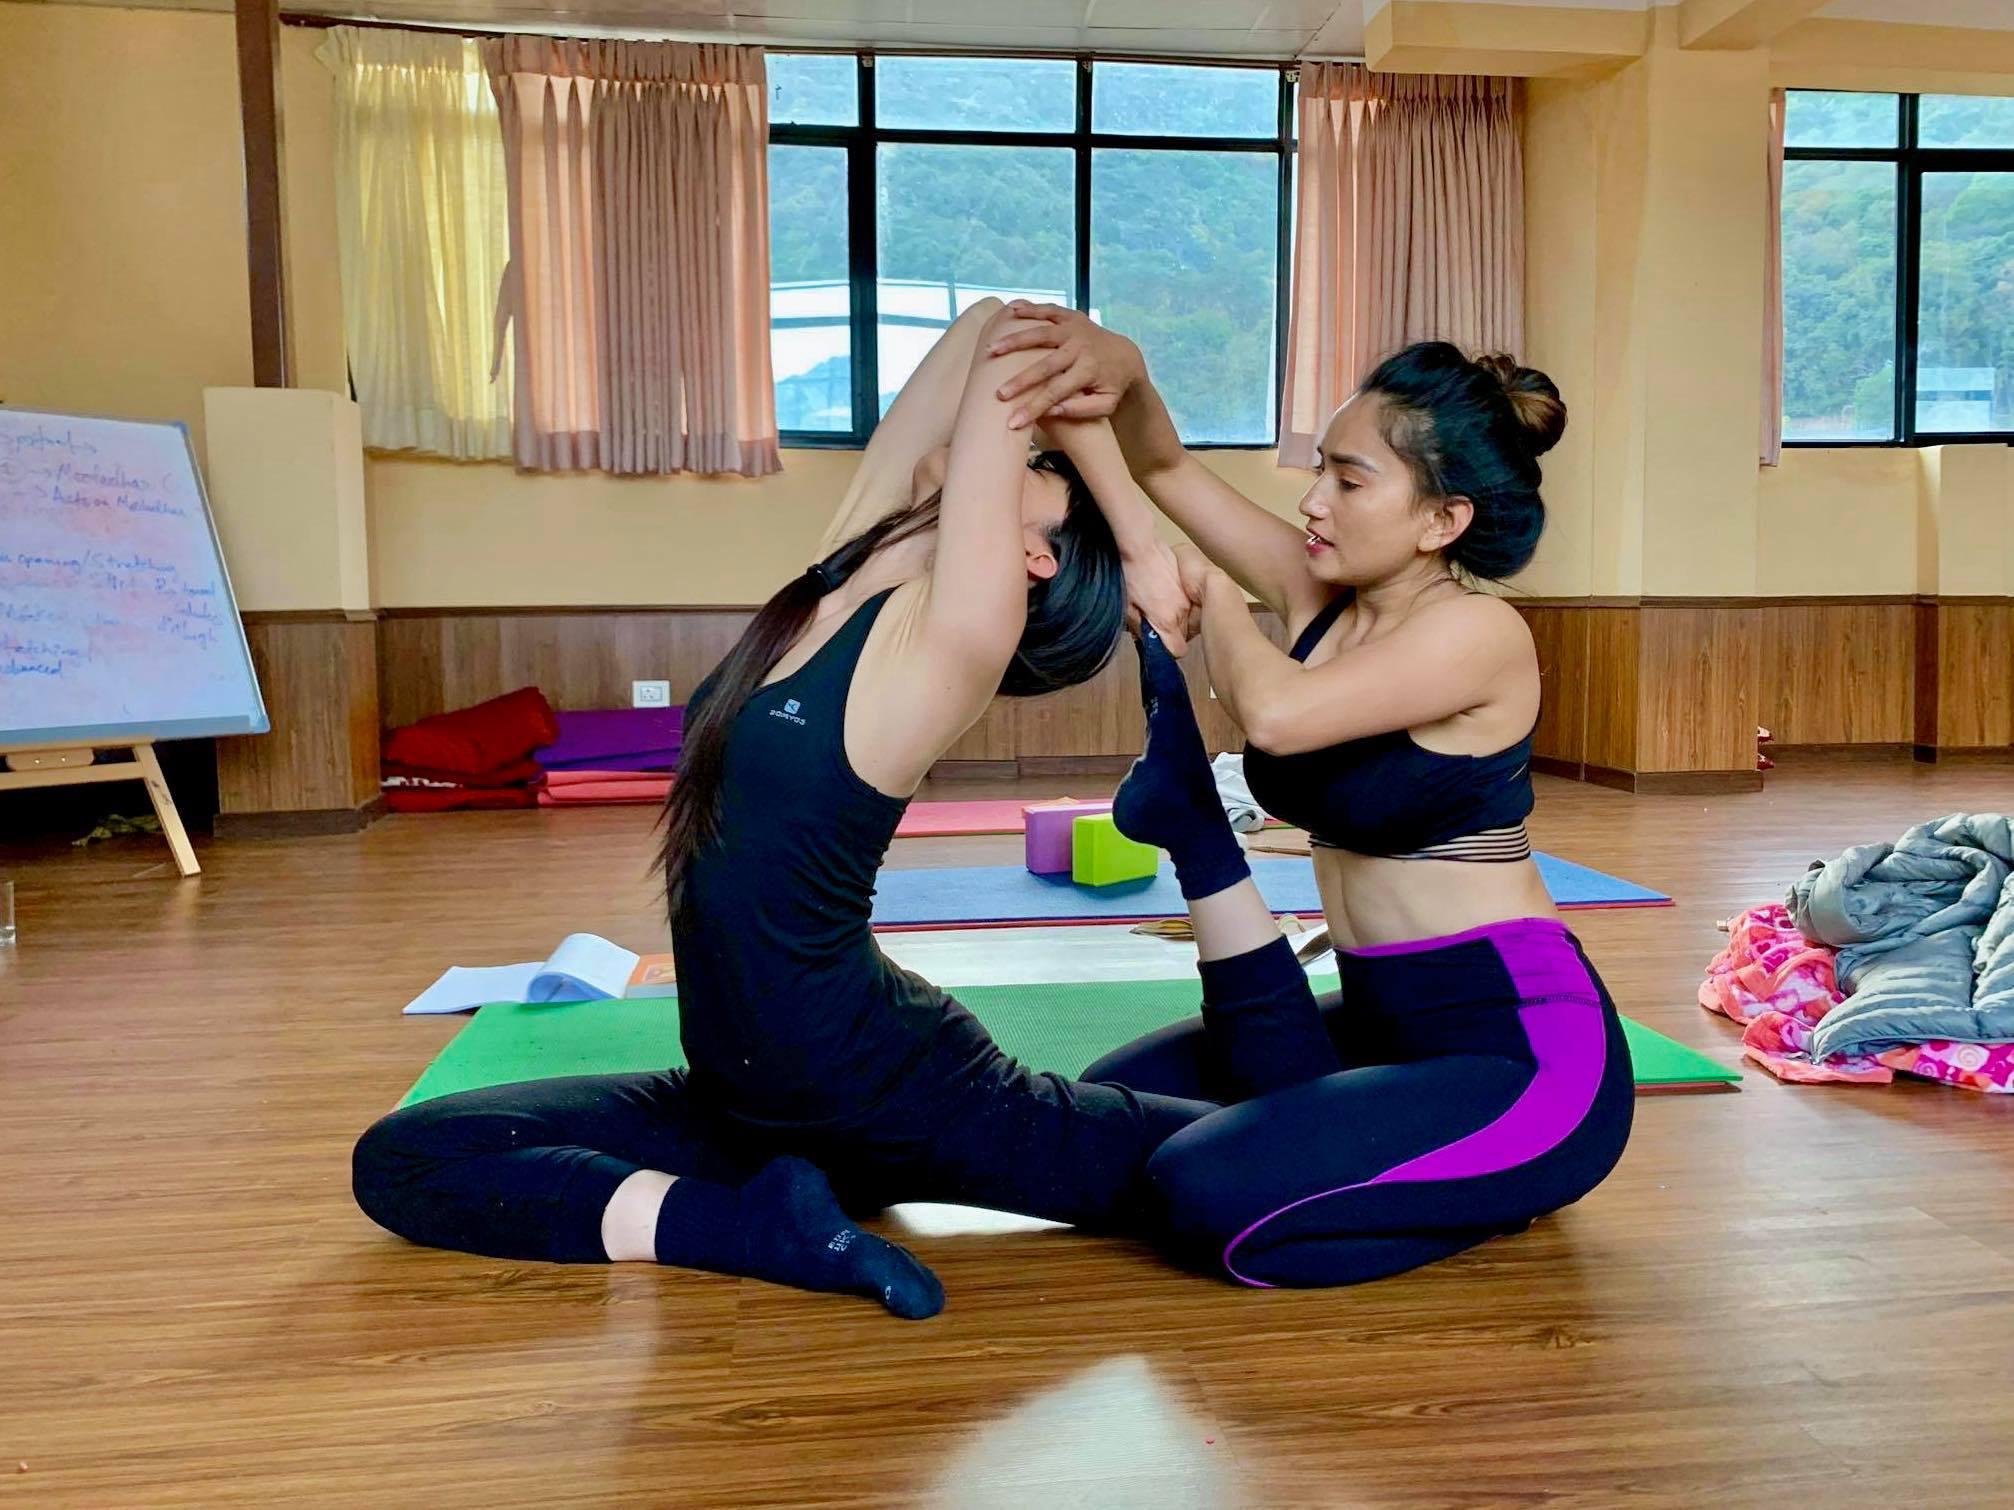 COVID-19 Quarantine And Yoga